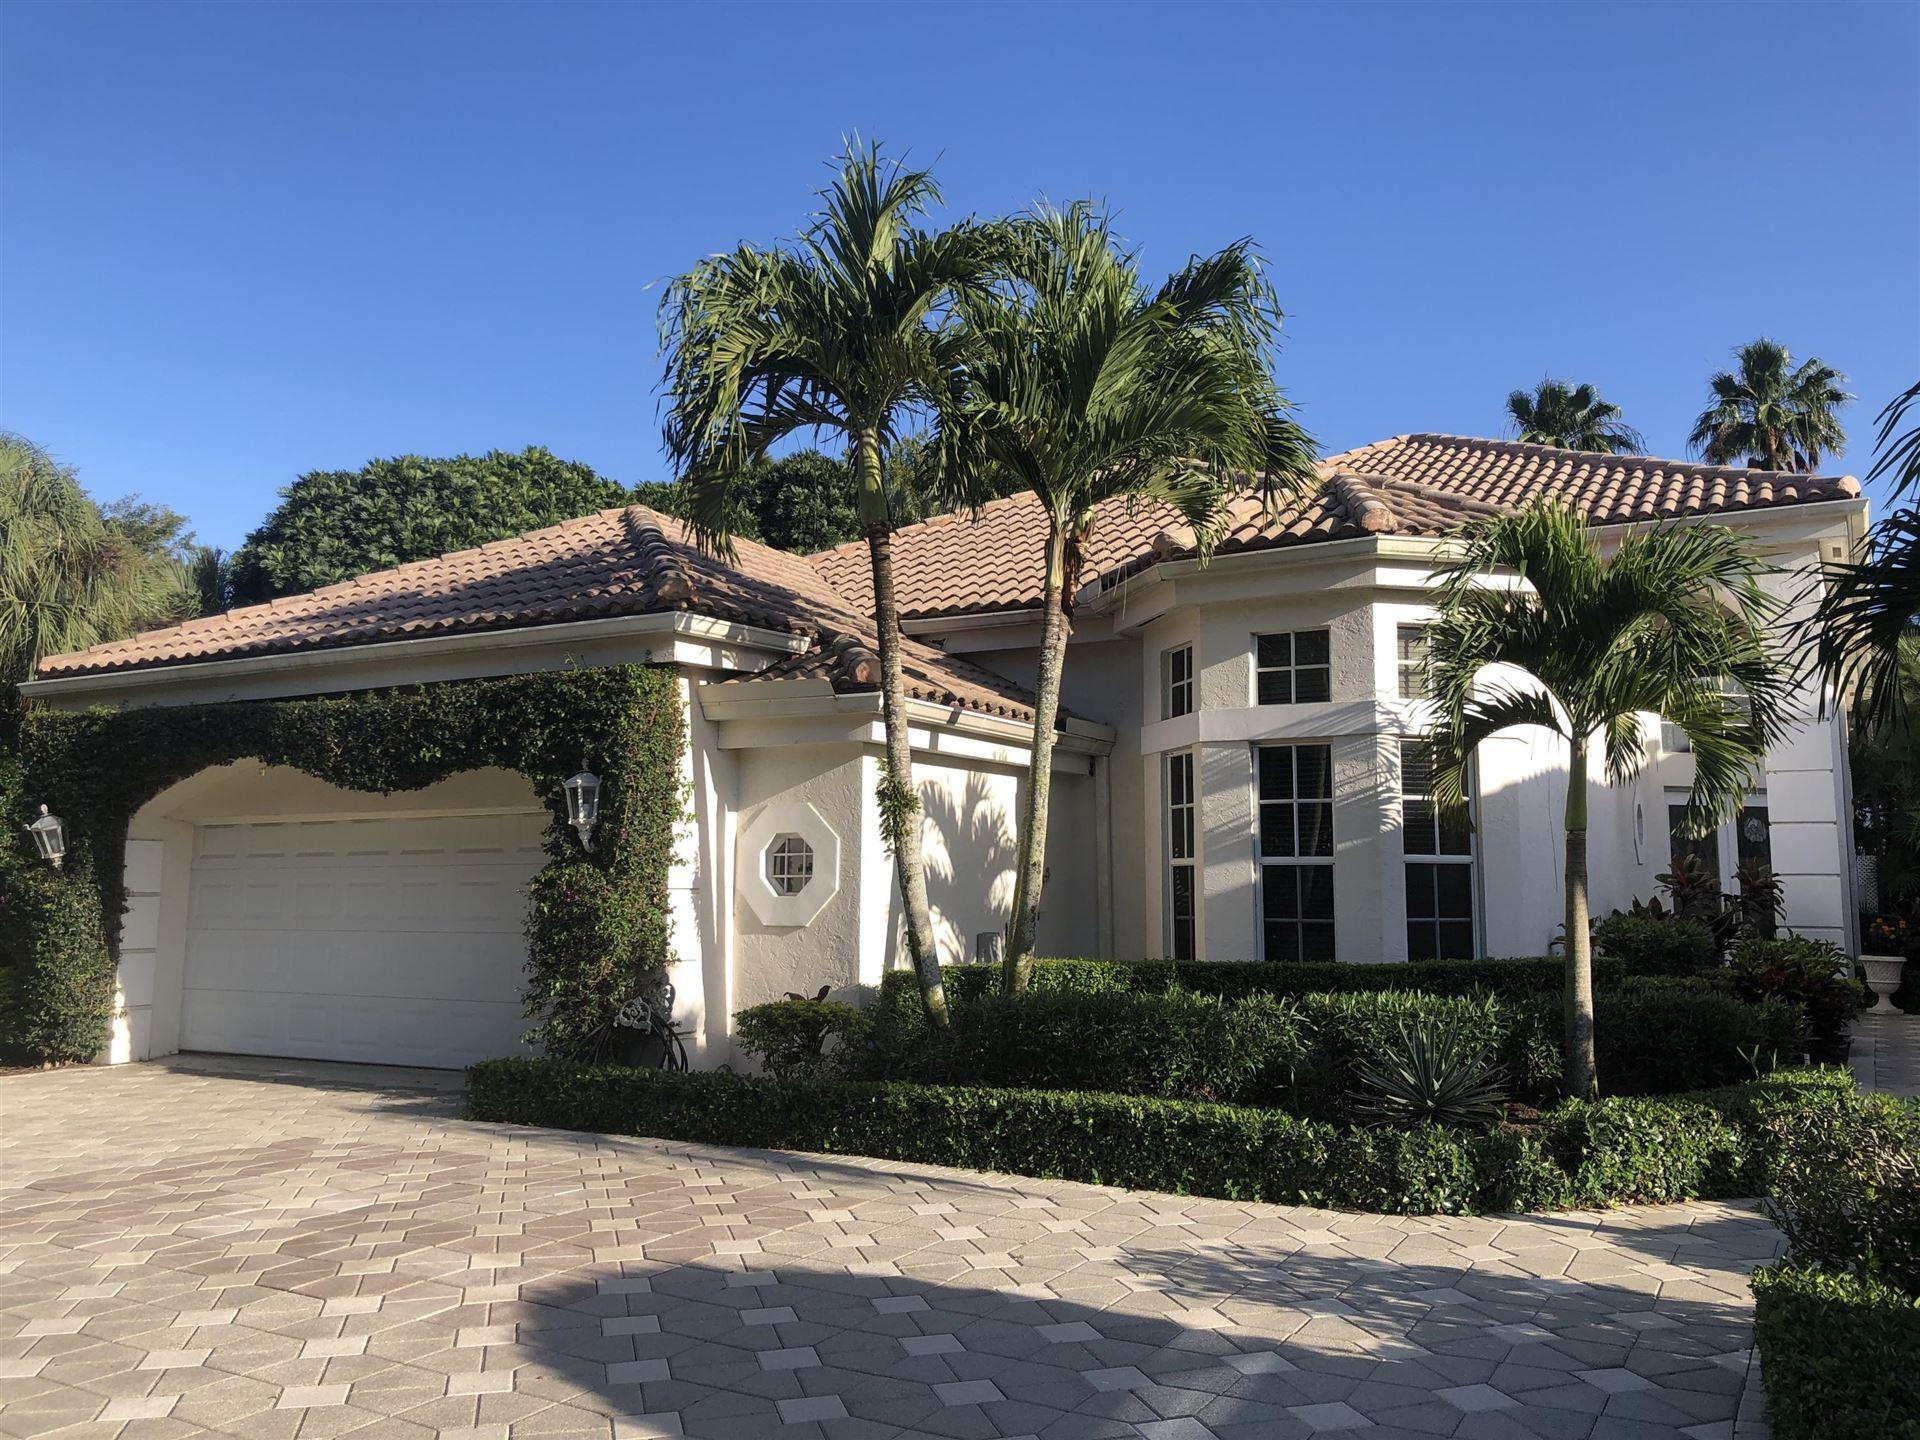 Photo of 101 Windward Drive, Palm Beach Gardens, FL 33418 (MLS # RX-10700945)